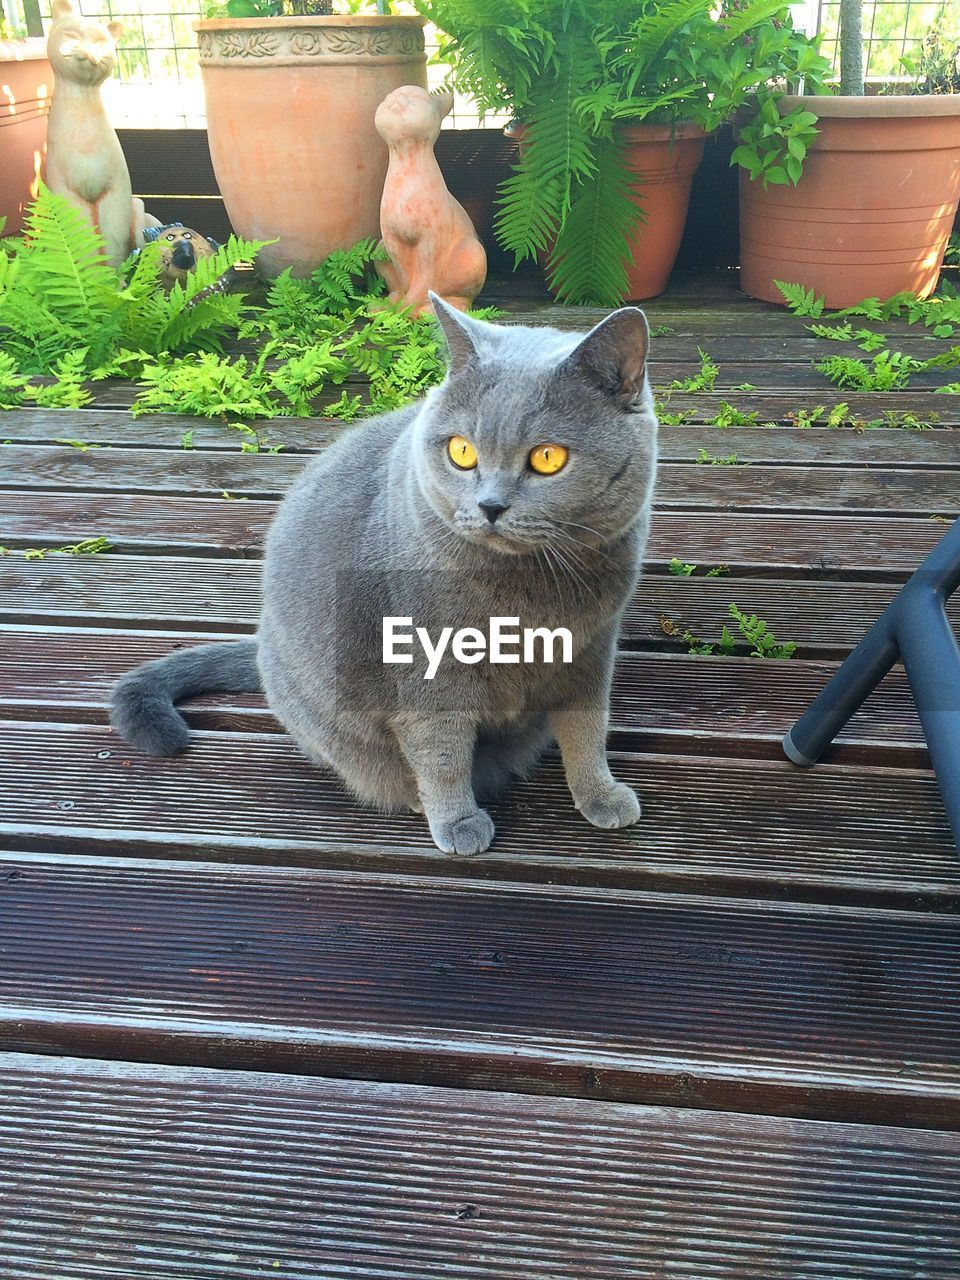 Gray cat on patio